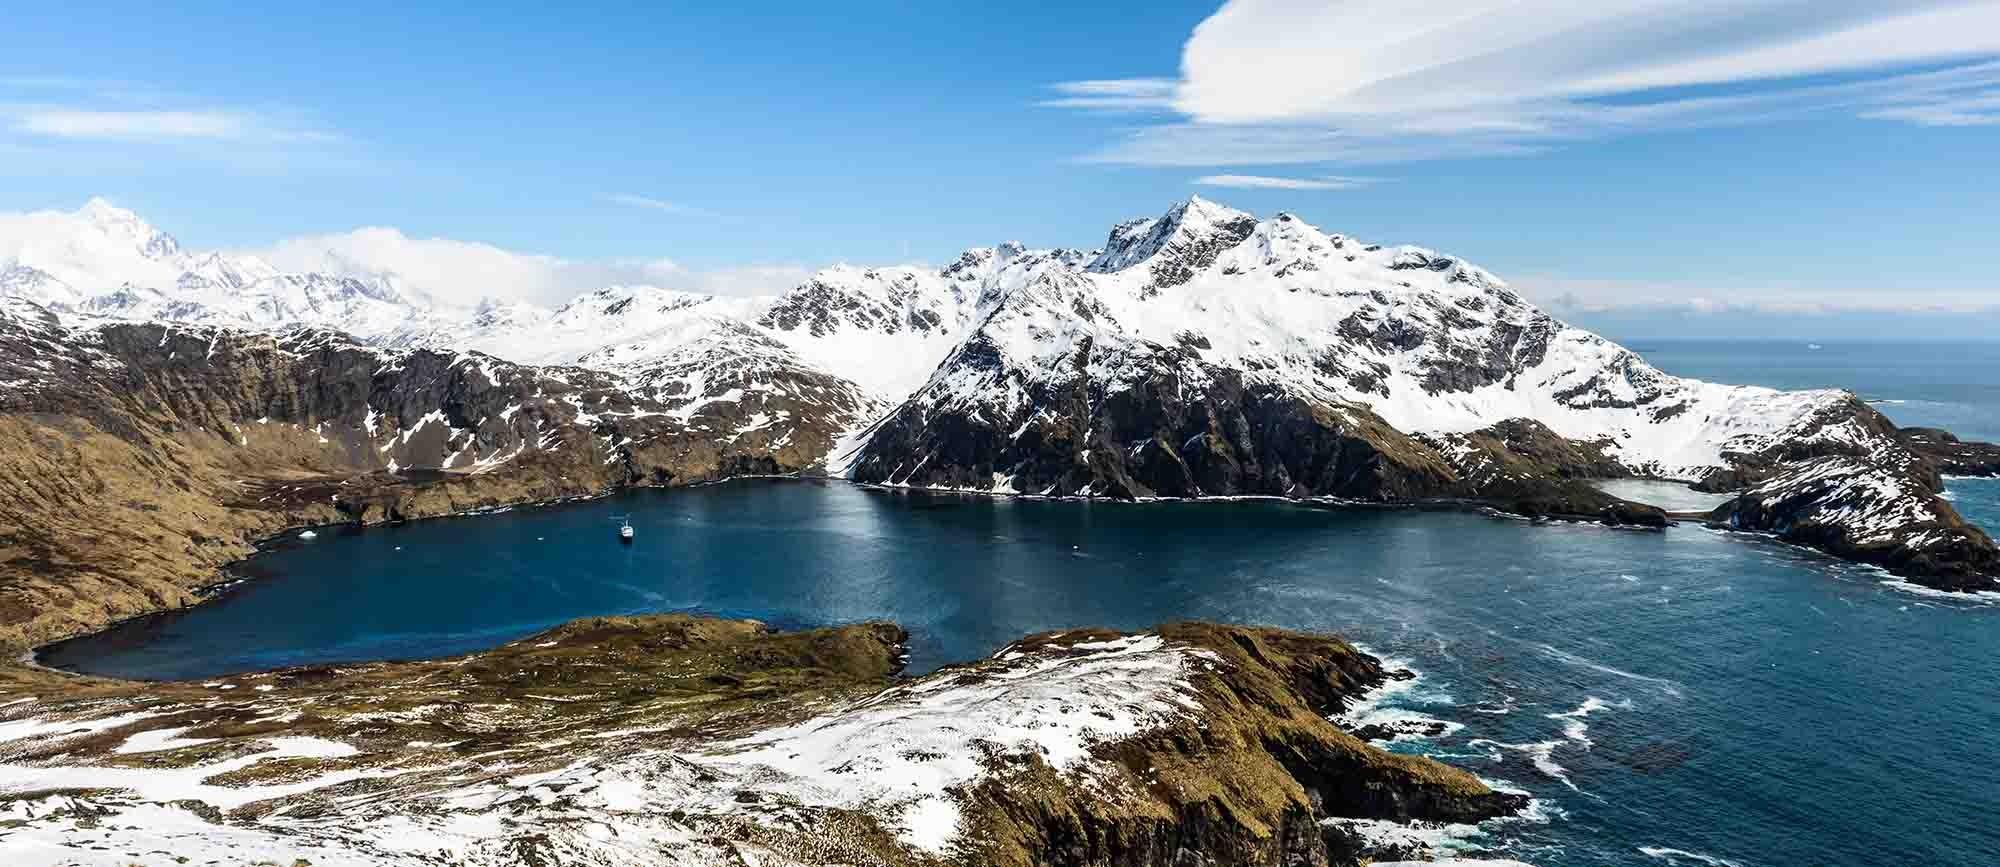 Antarctica vacations